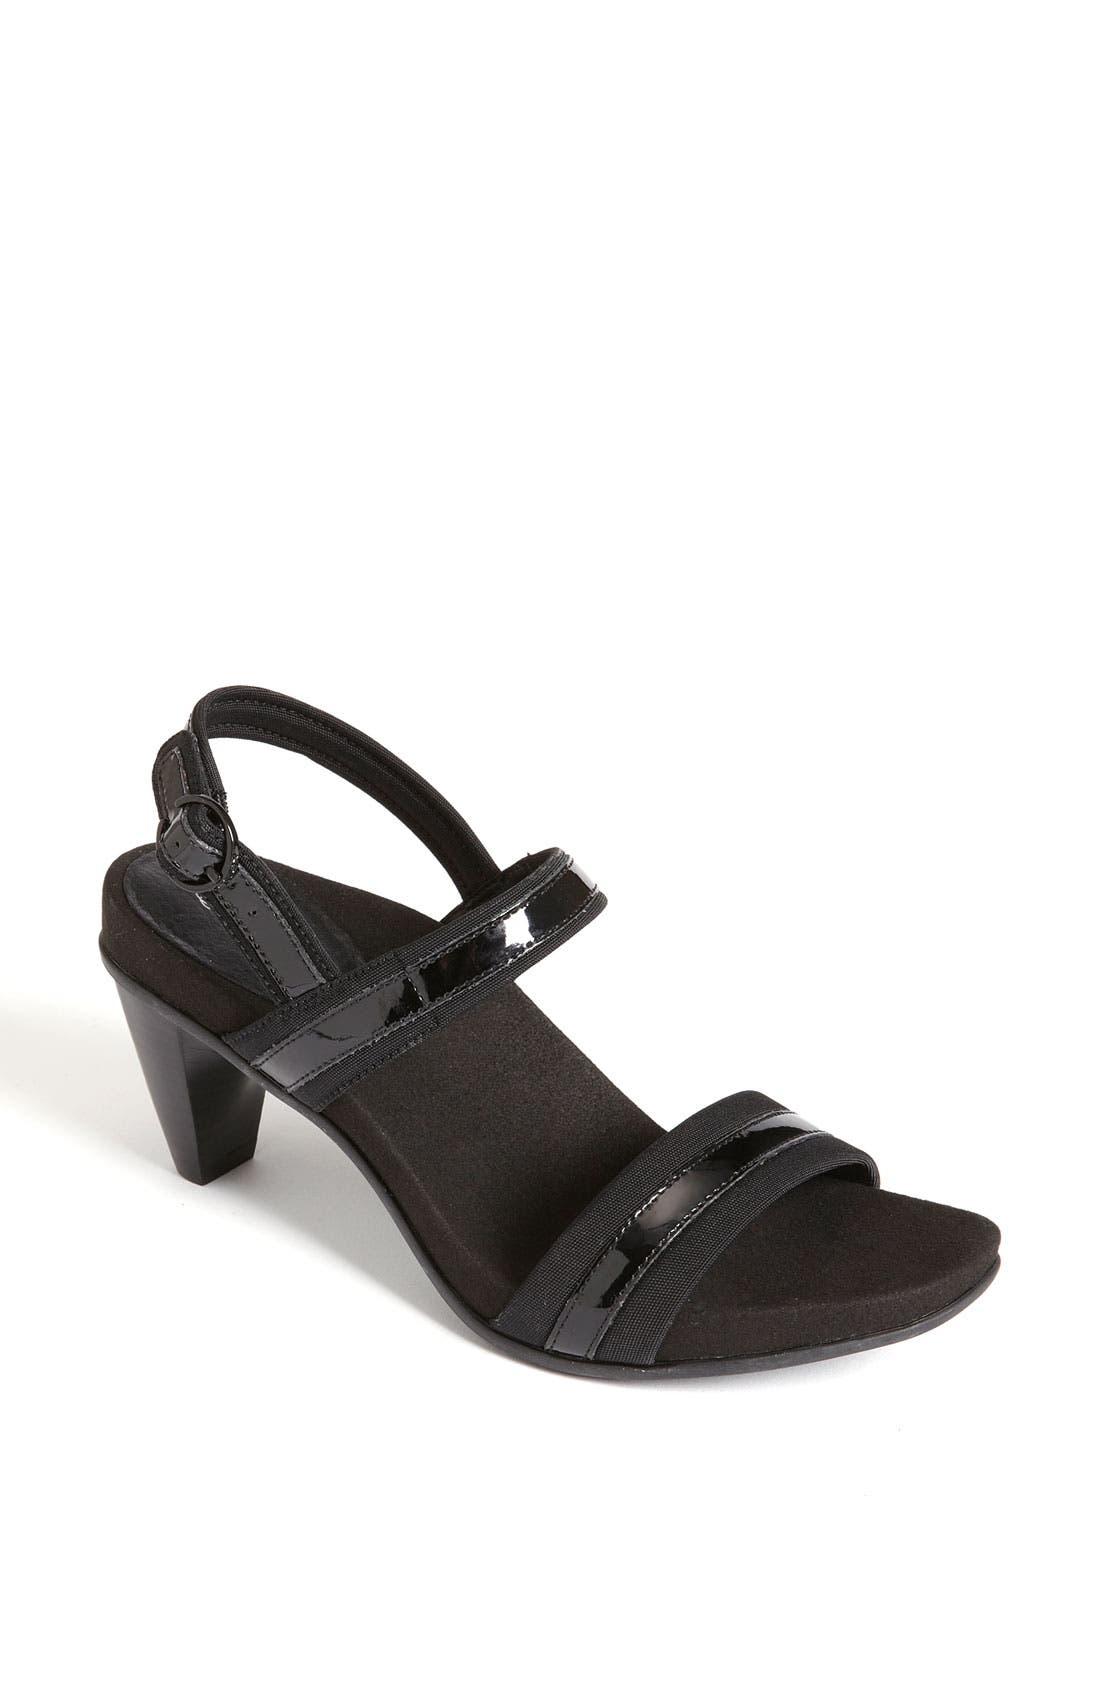 Alternate Image 1 Selected - Aetrex 'Kate' Sandal